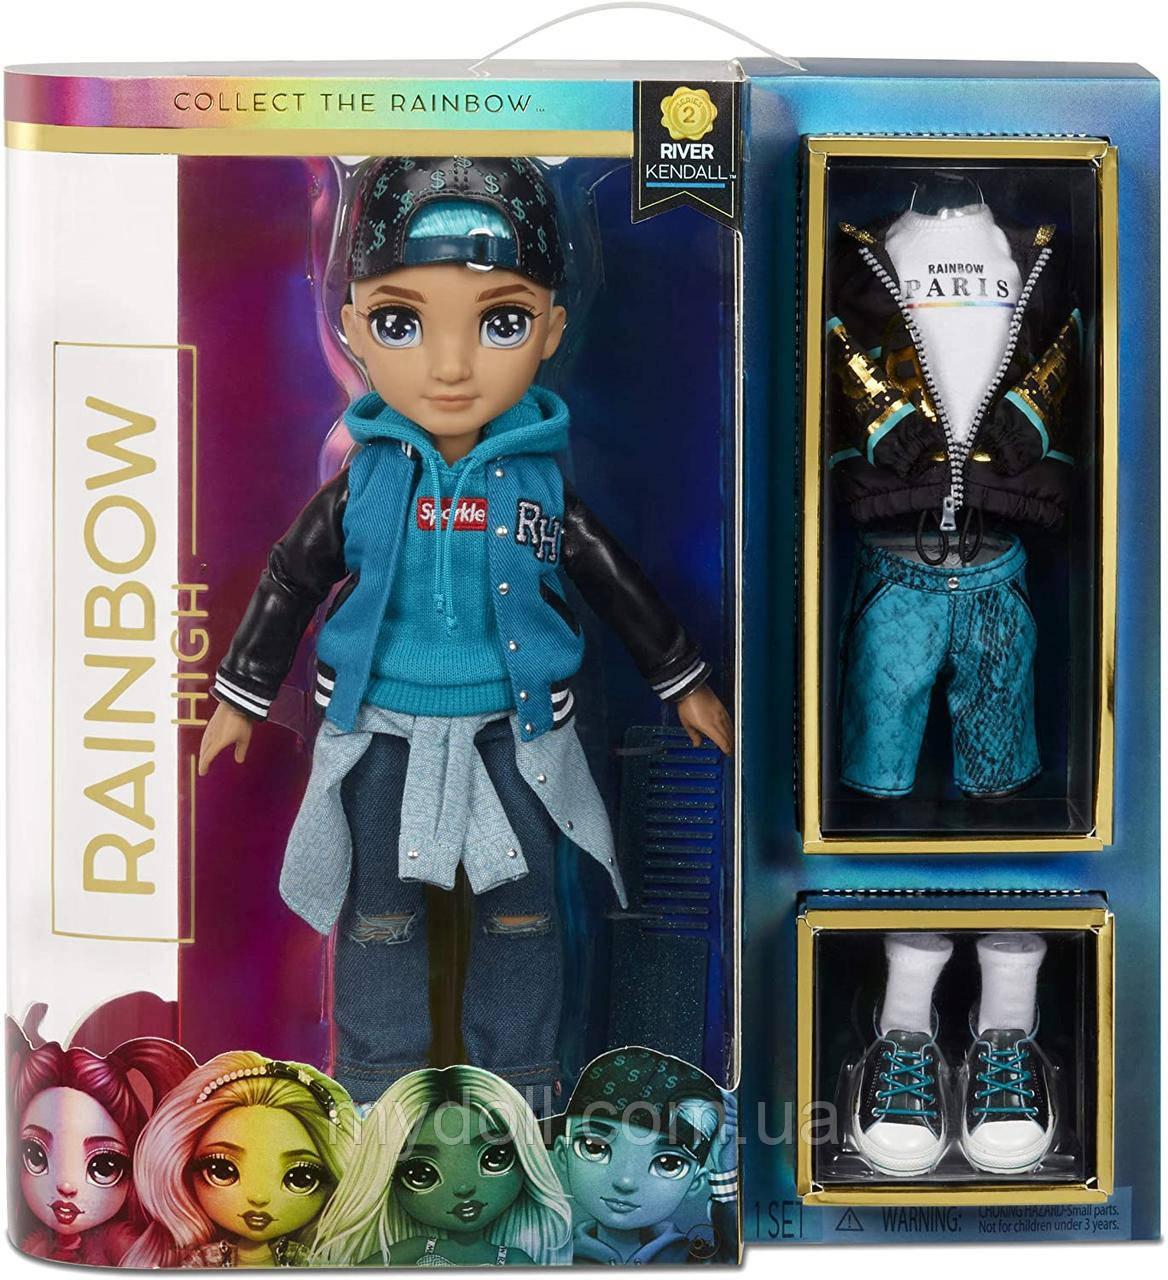 Кукла Rainbow High S2 Рейнбоу Хай Ривер Кендалл River Kendall 572145 Оригинал